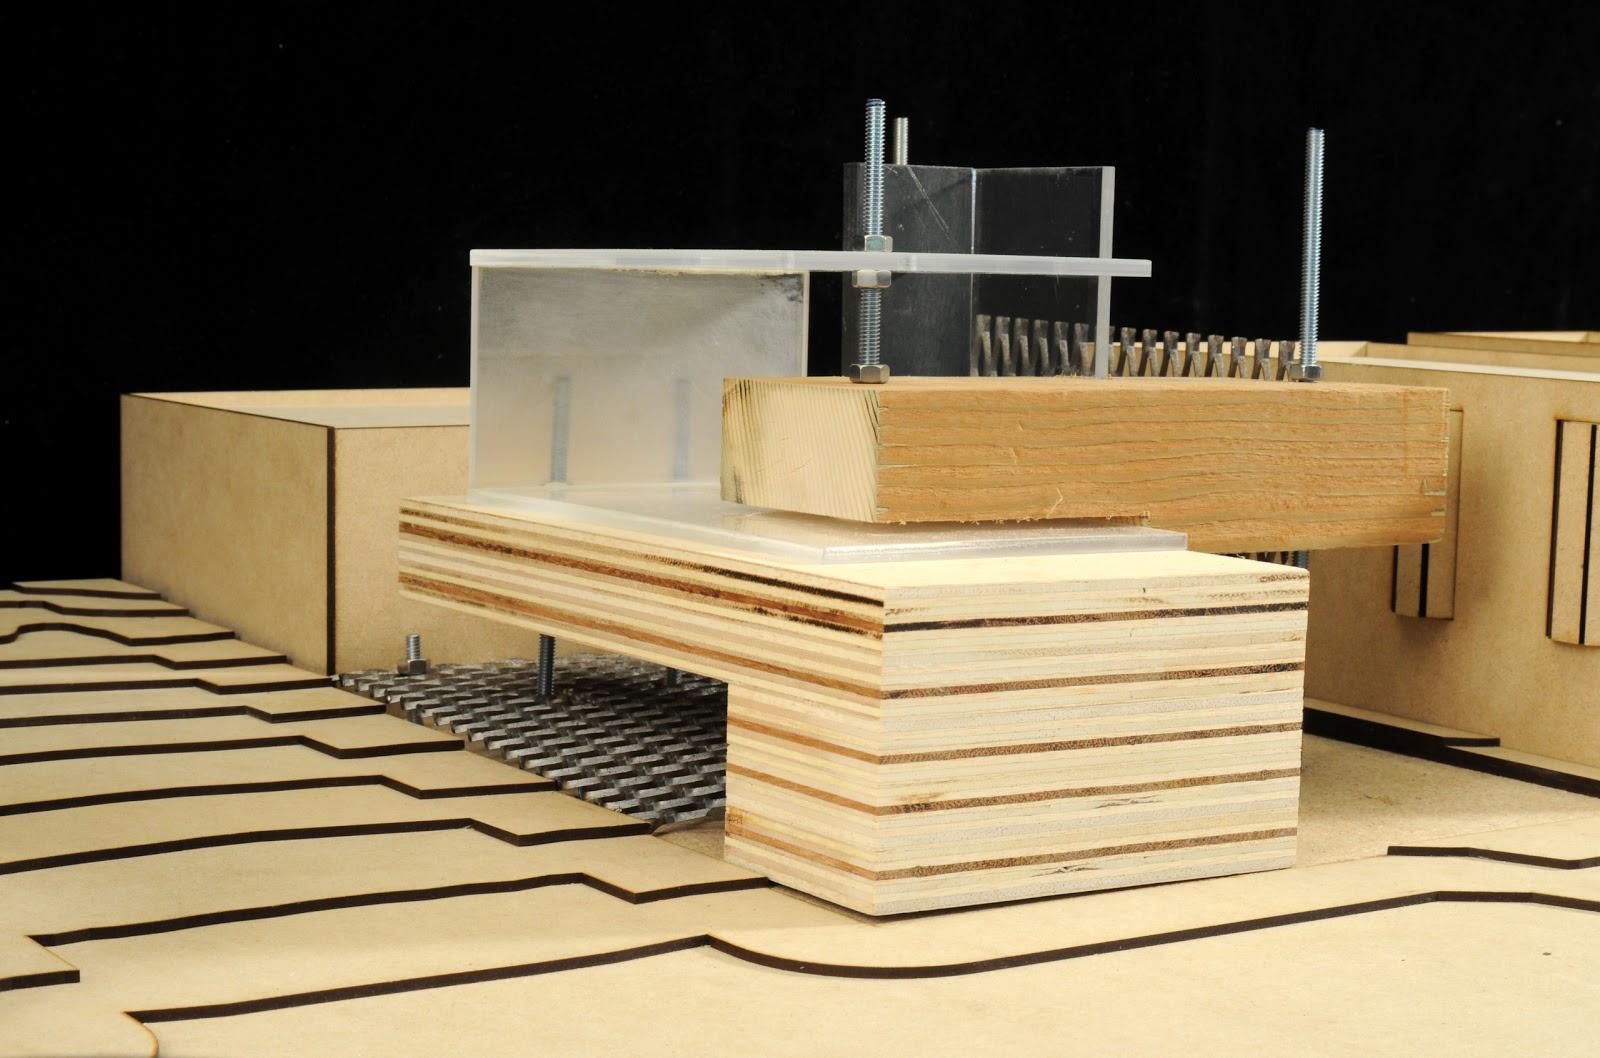 architecture model galleries architecture resumes 28 architecture model galleries architecture model materials